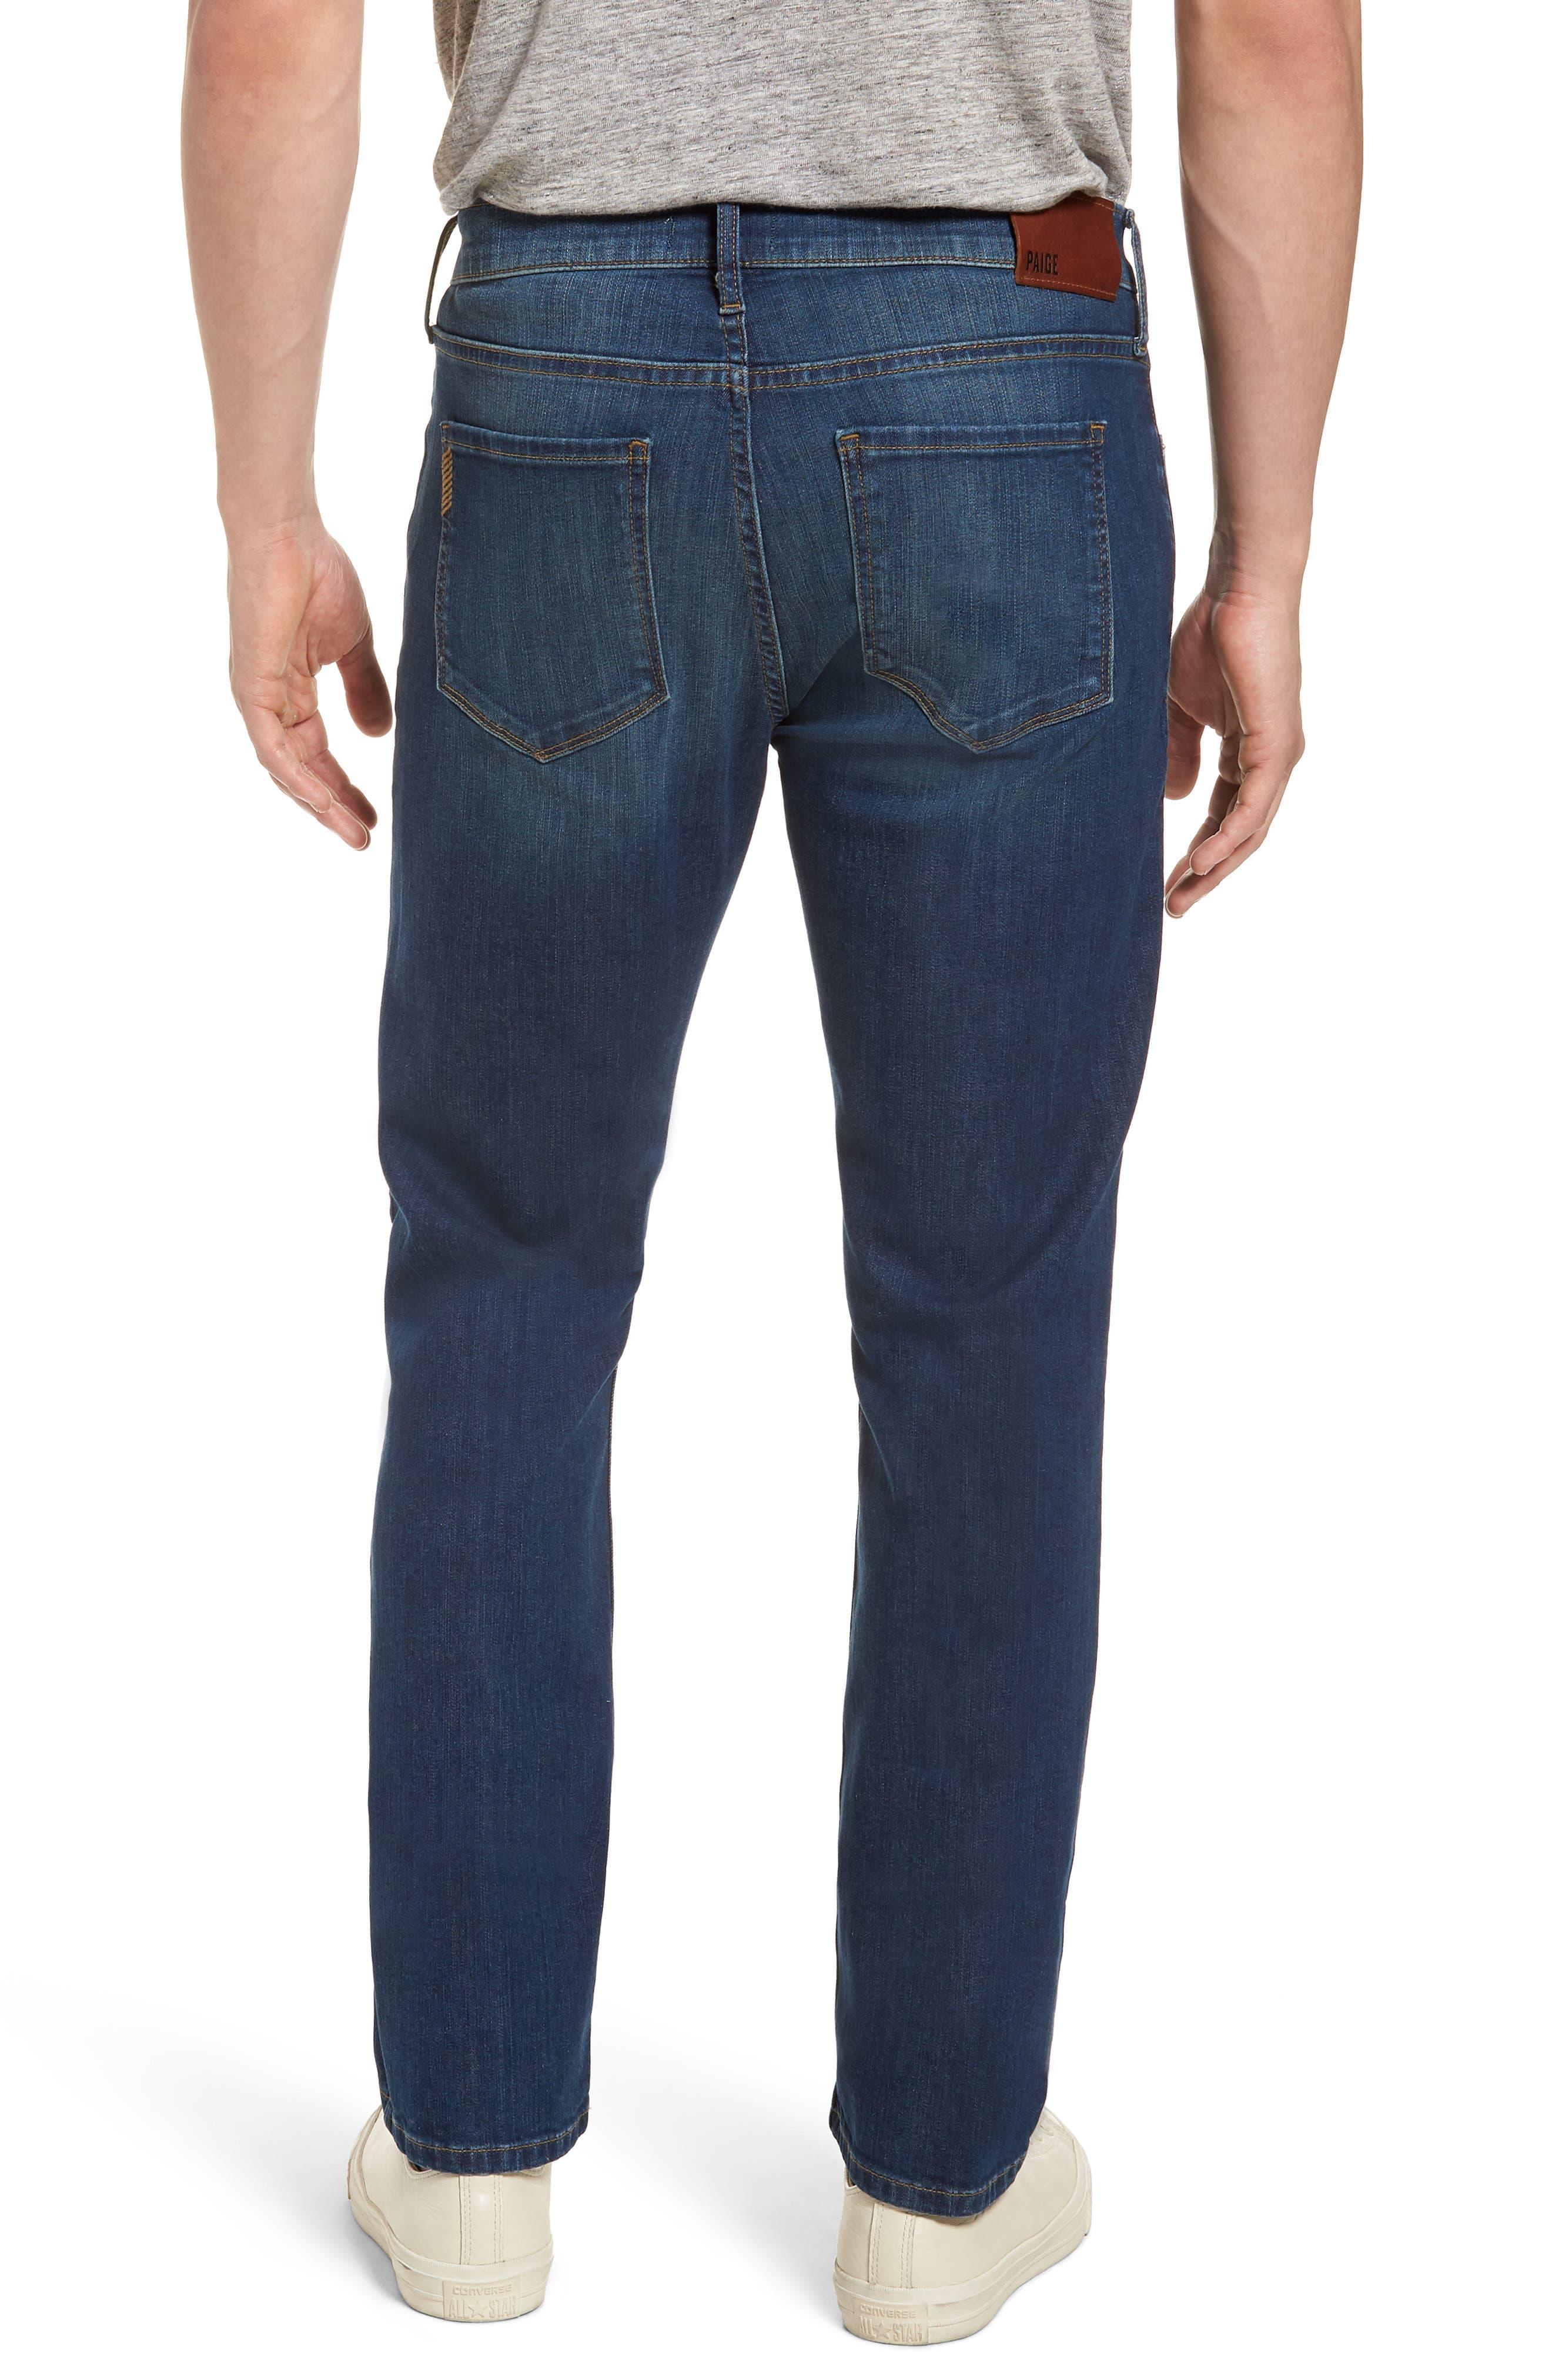 Lennox Slim Fit Jeans,                             Alternate thumbnail 2, color,                             Harlan Destructed